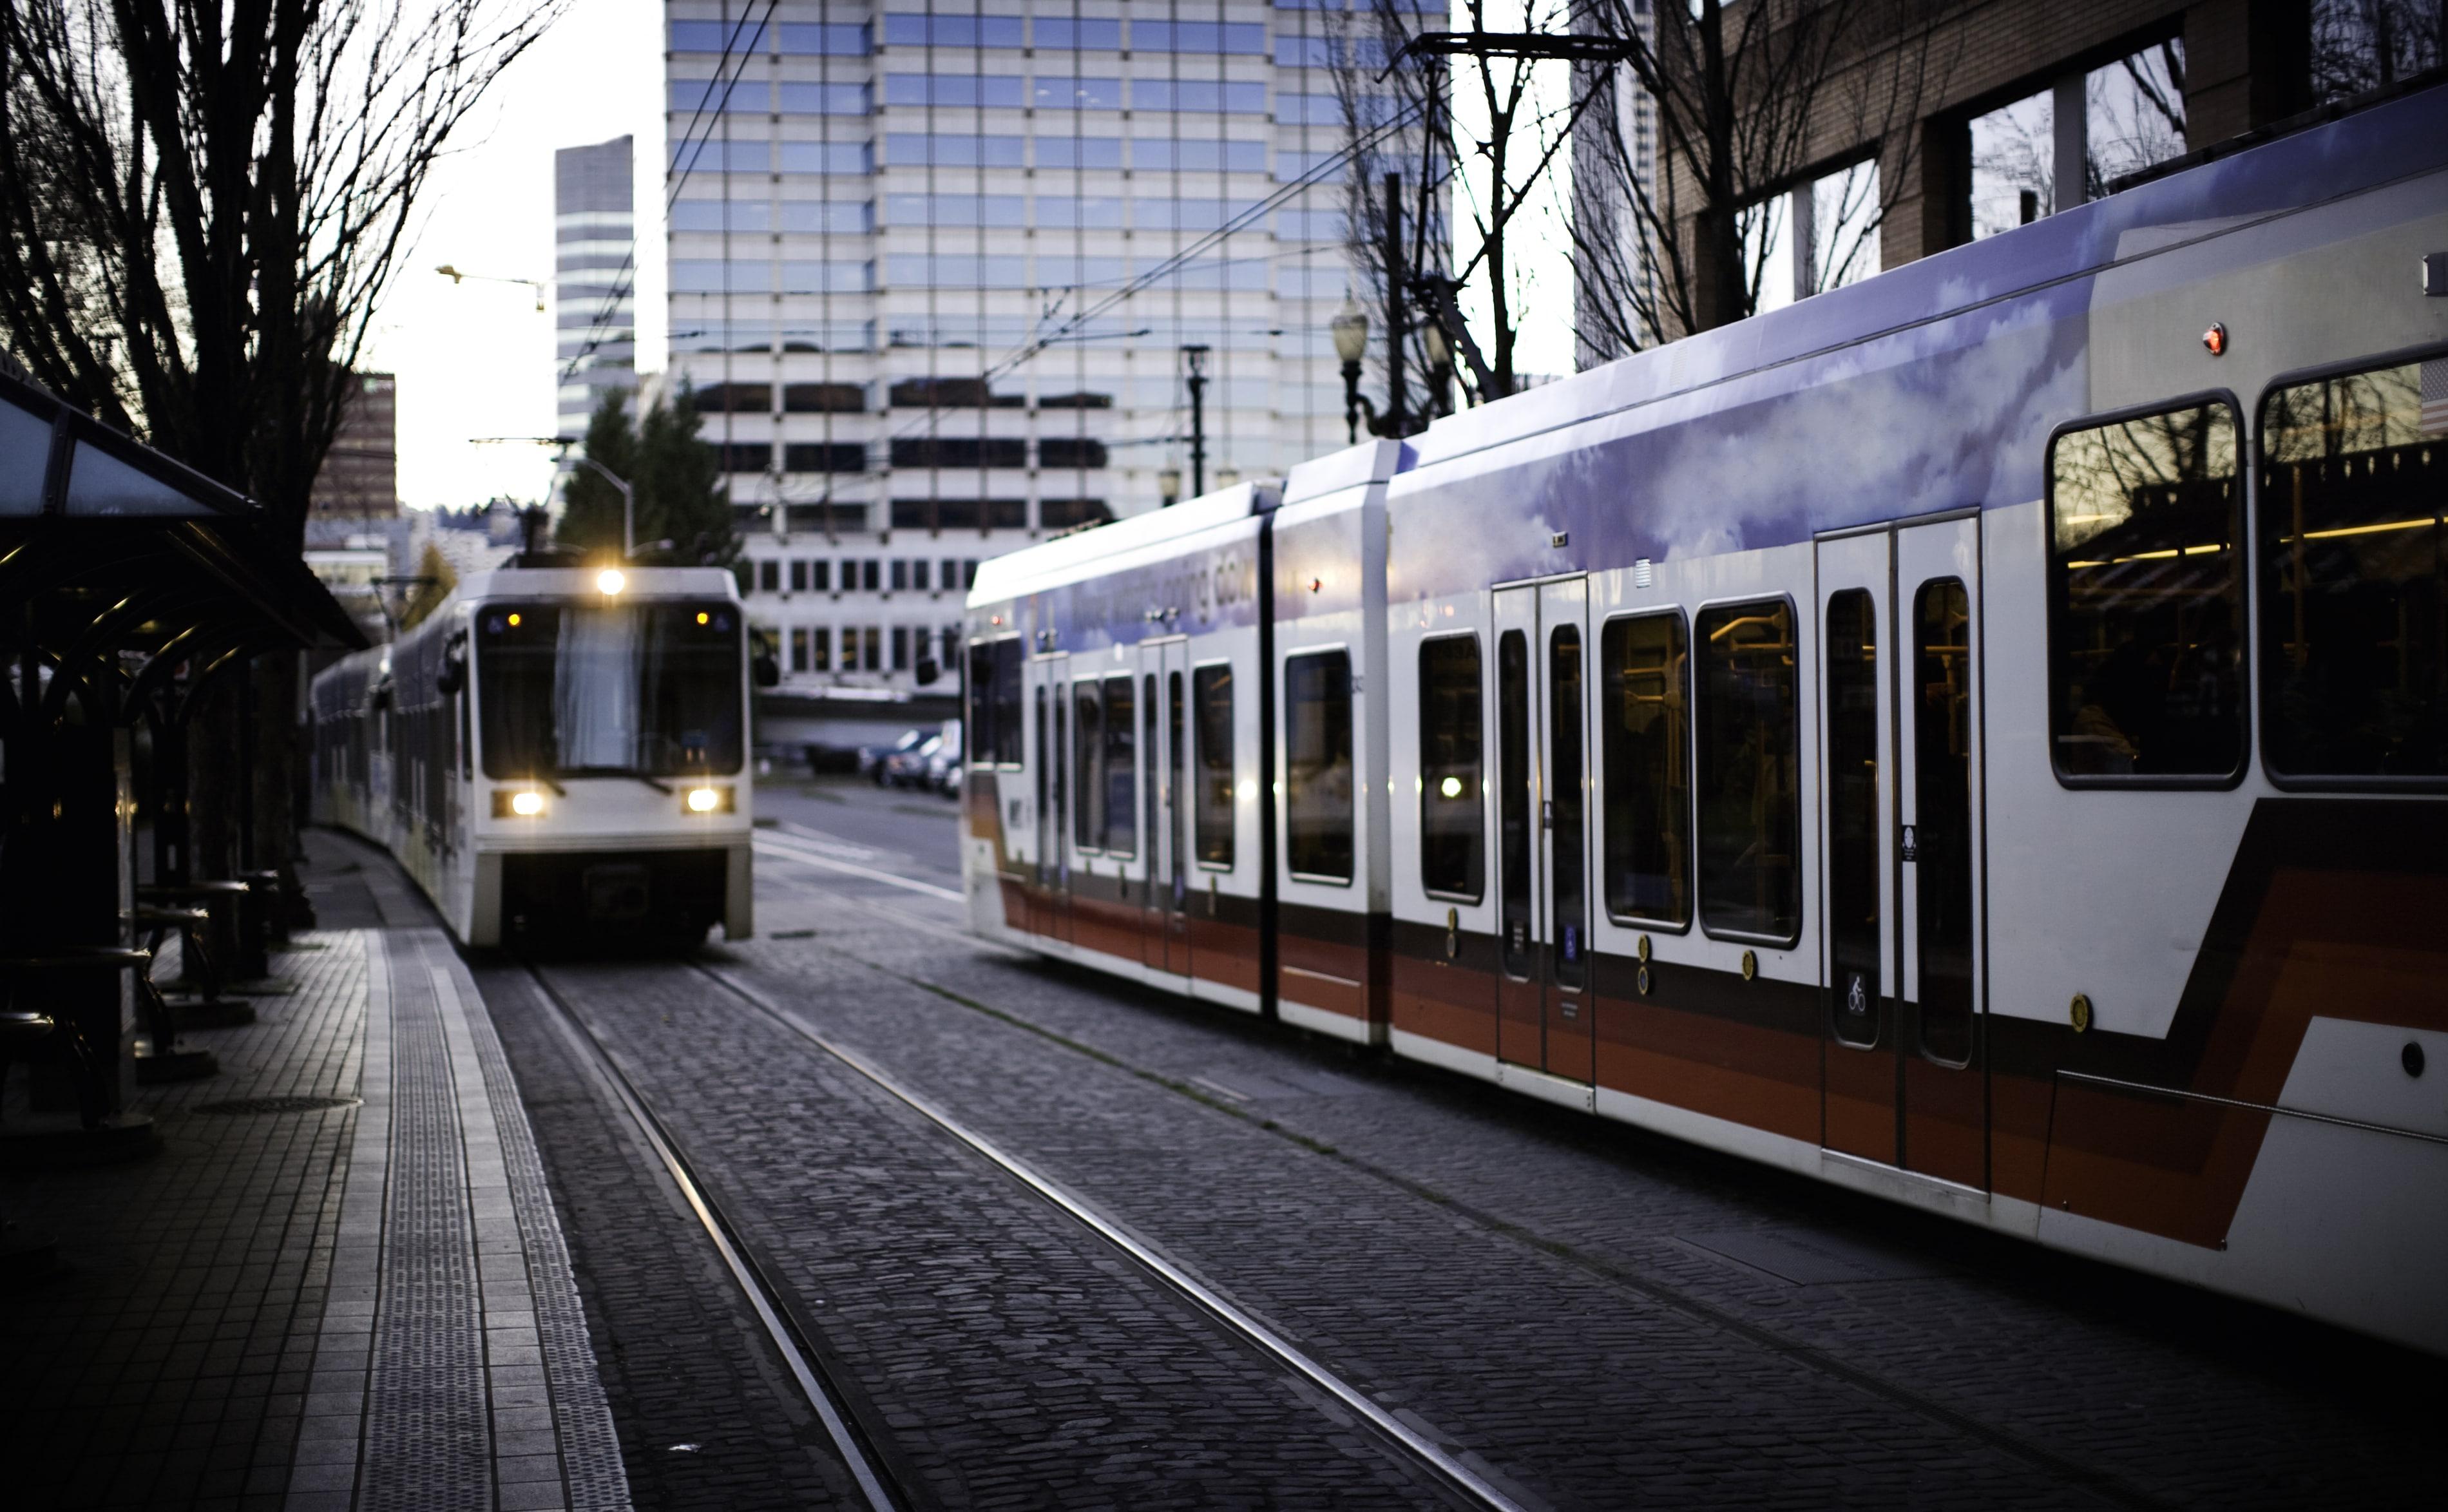 transit-cooling-light-rail-website